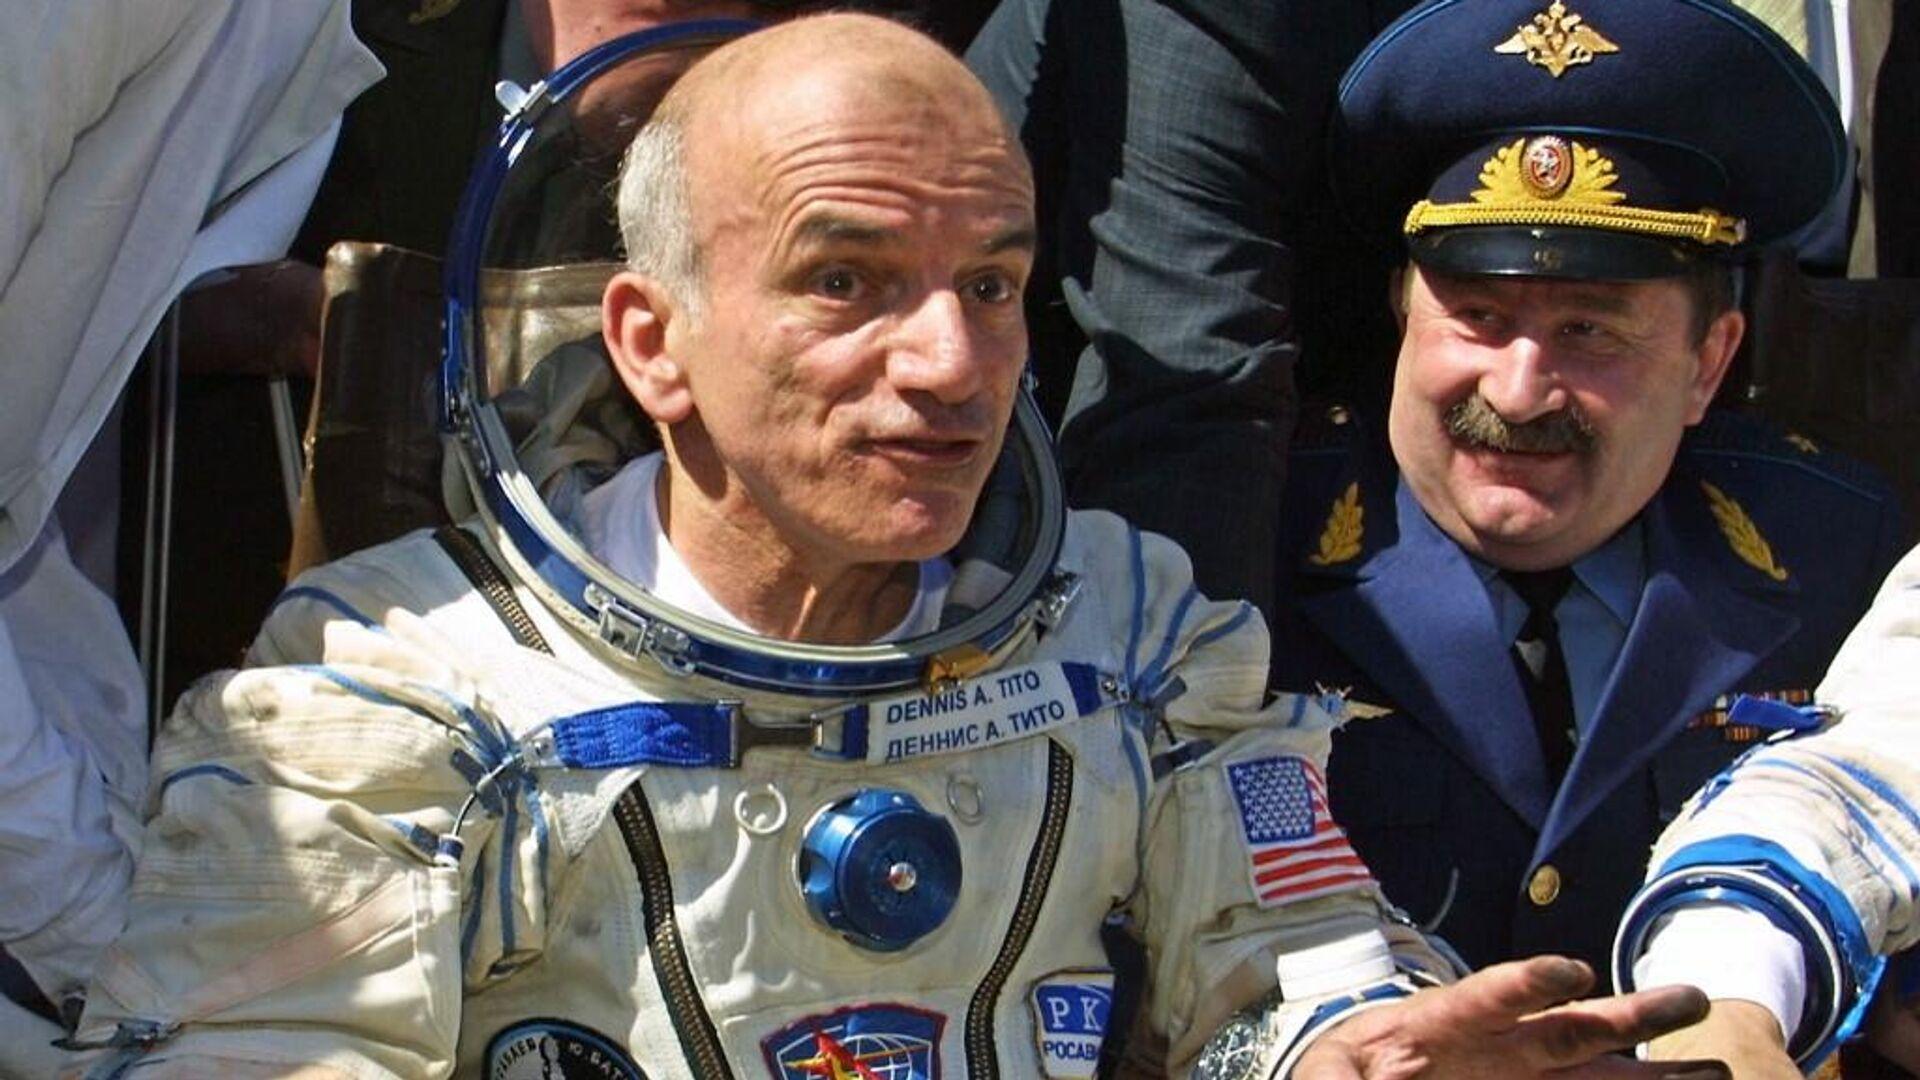 El primer turista espacial de la historia, Dennis Tito - Sputnik Mundo, 1920, 08.06.2021